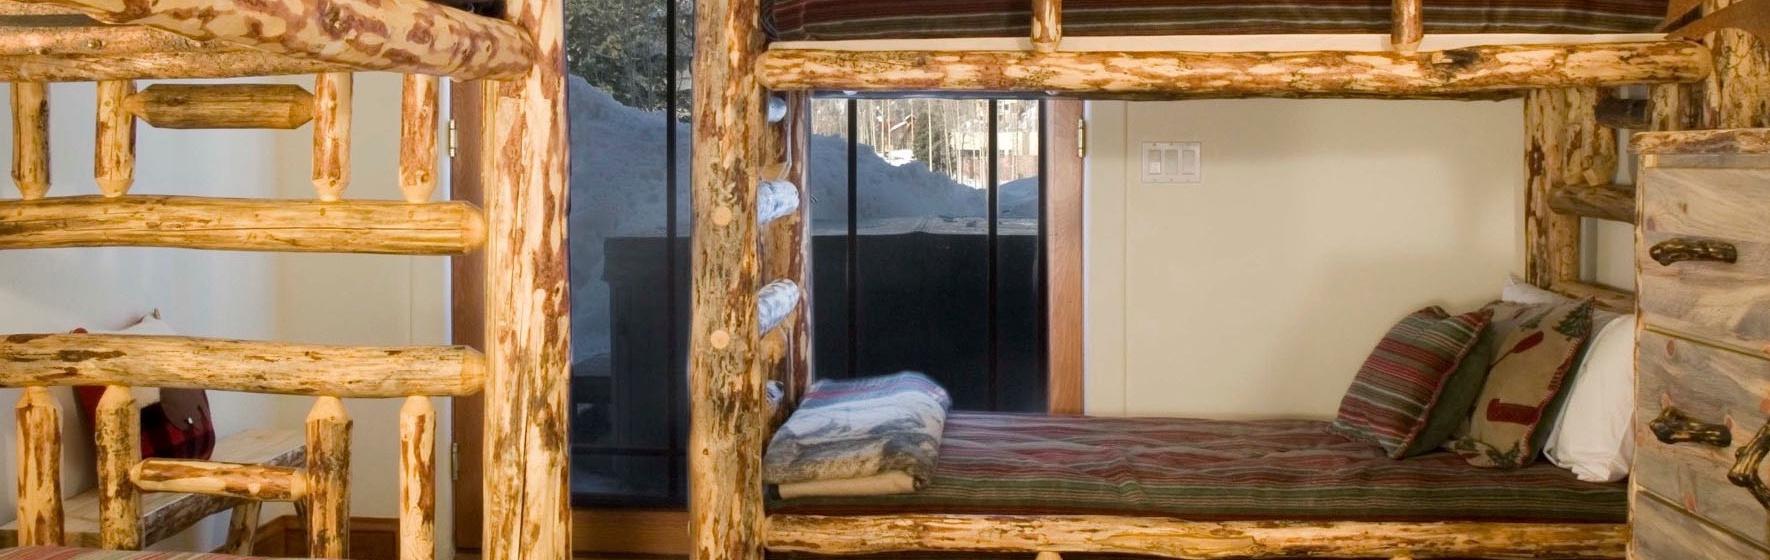 15-MountainVillage-PineMeadows138-BunkRoom-V12.jpg